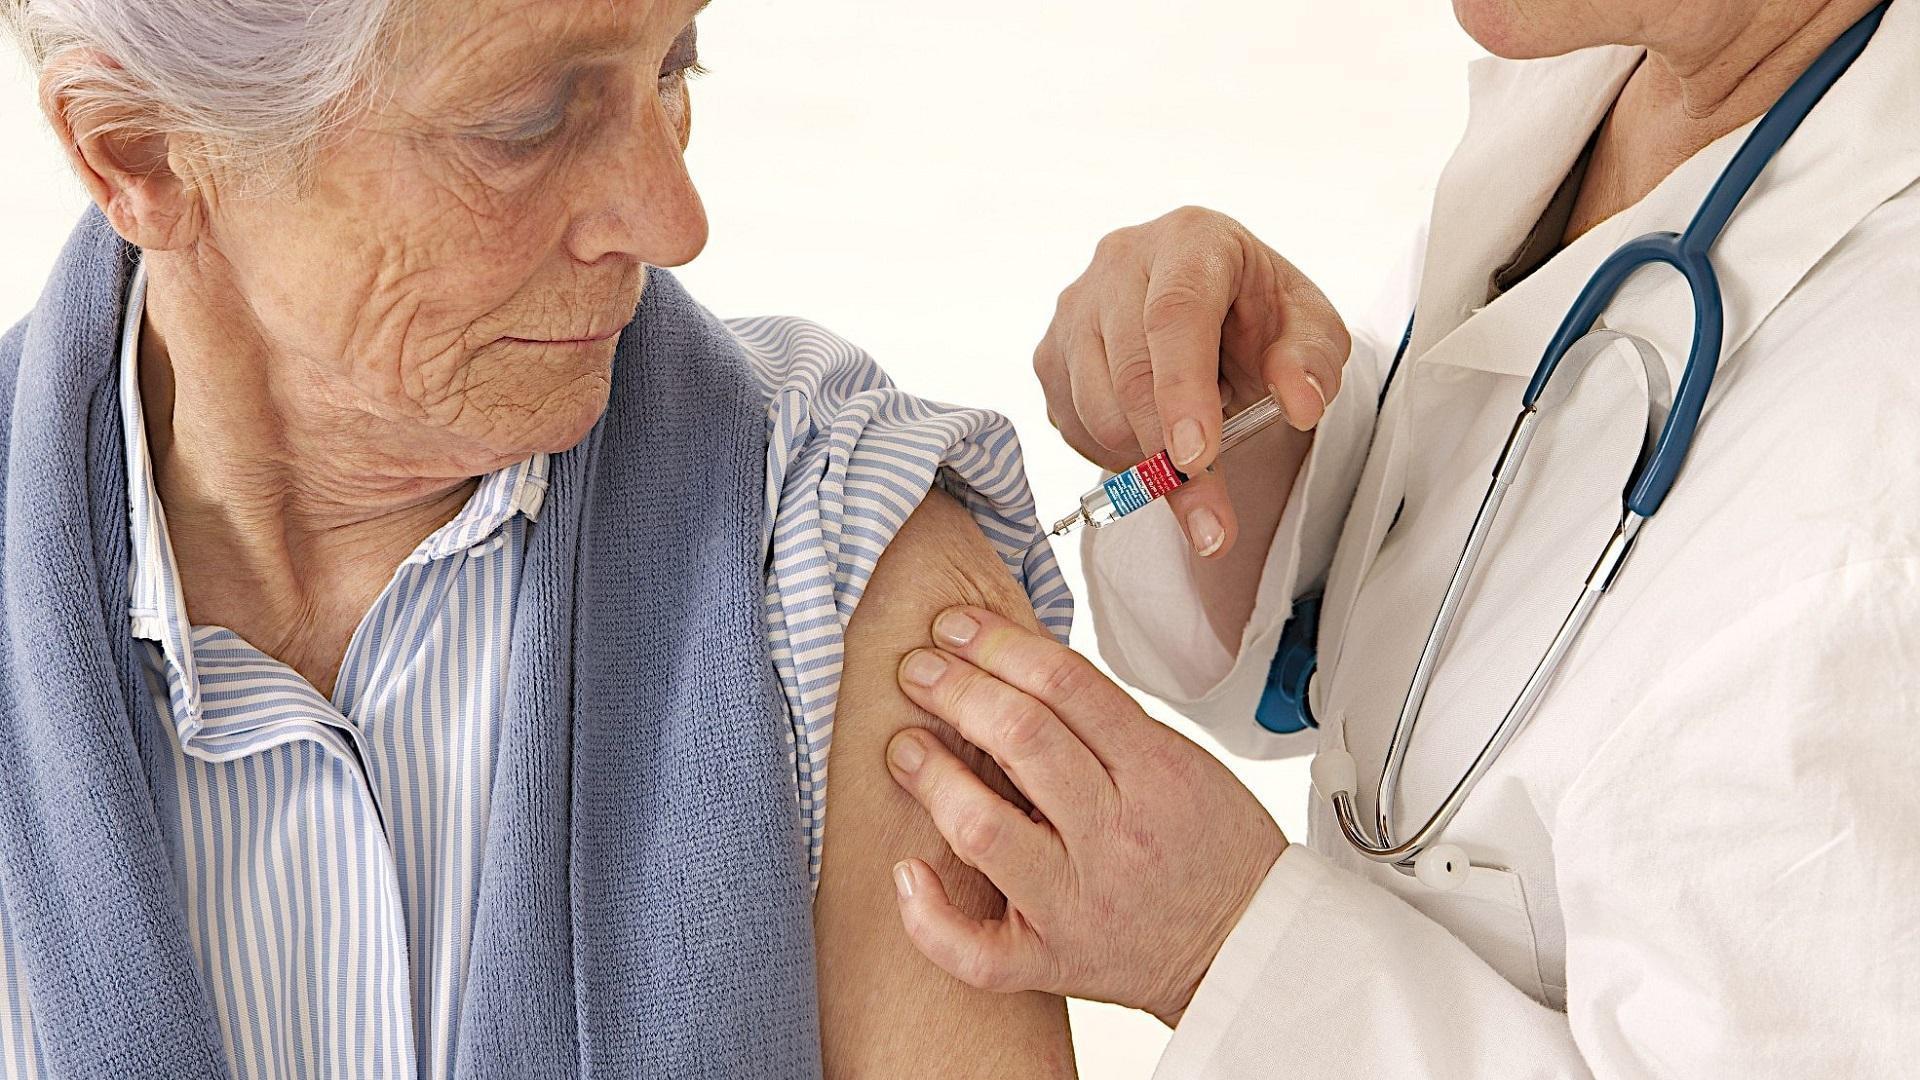 Вакцина от болезни Альцгеймера успешно опробована на грызунах